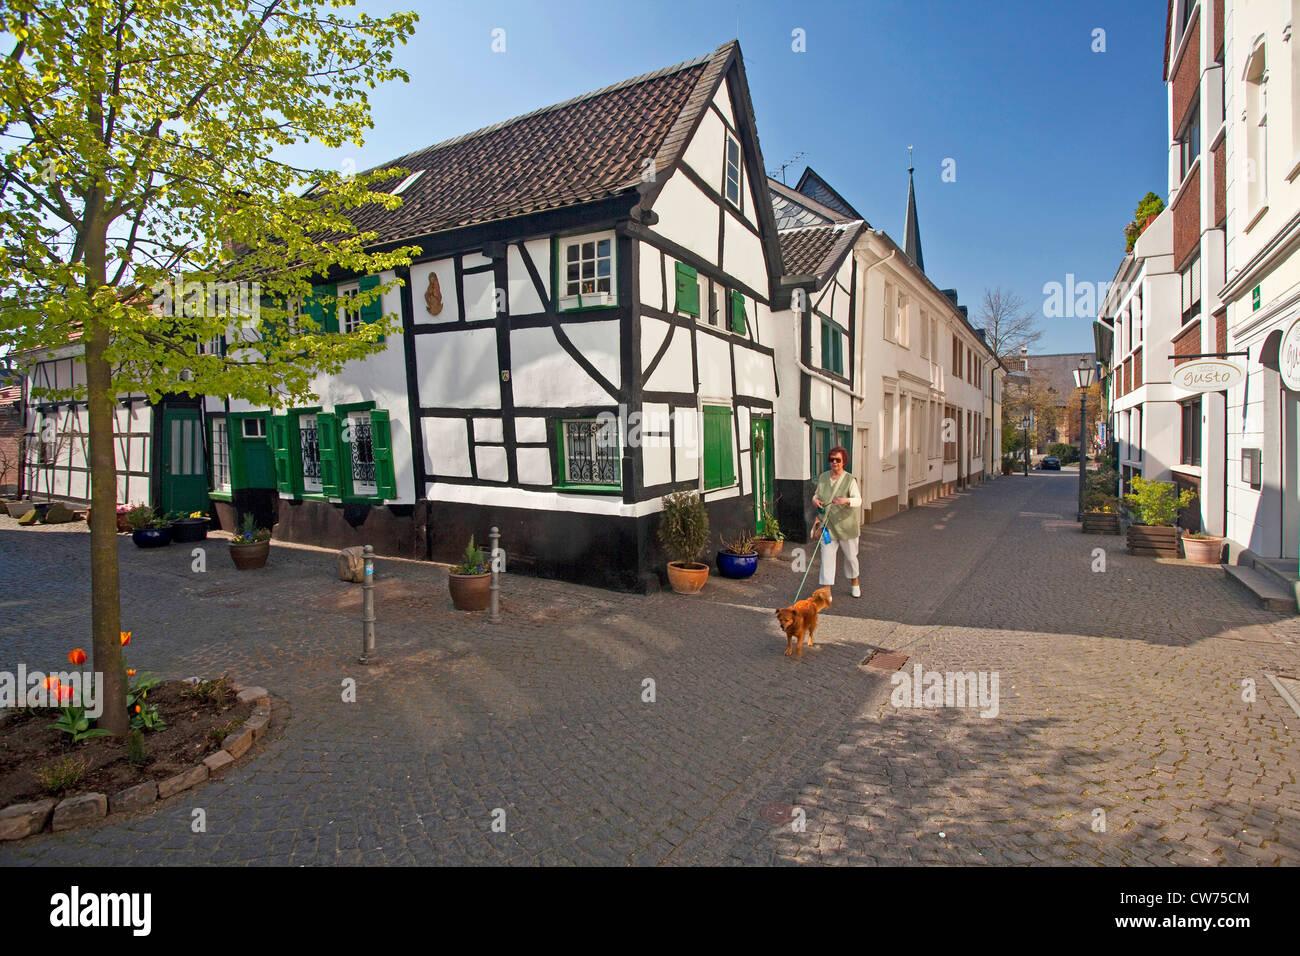 woman walking her dog in the old city of Muelheim/Ruhr, Germany, North Rhine-Westphalia, Ruhr Area, Muelheim an - Stock Image